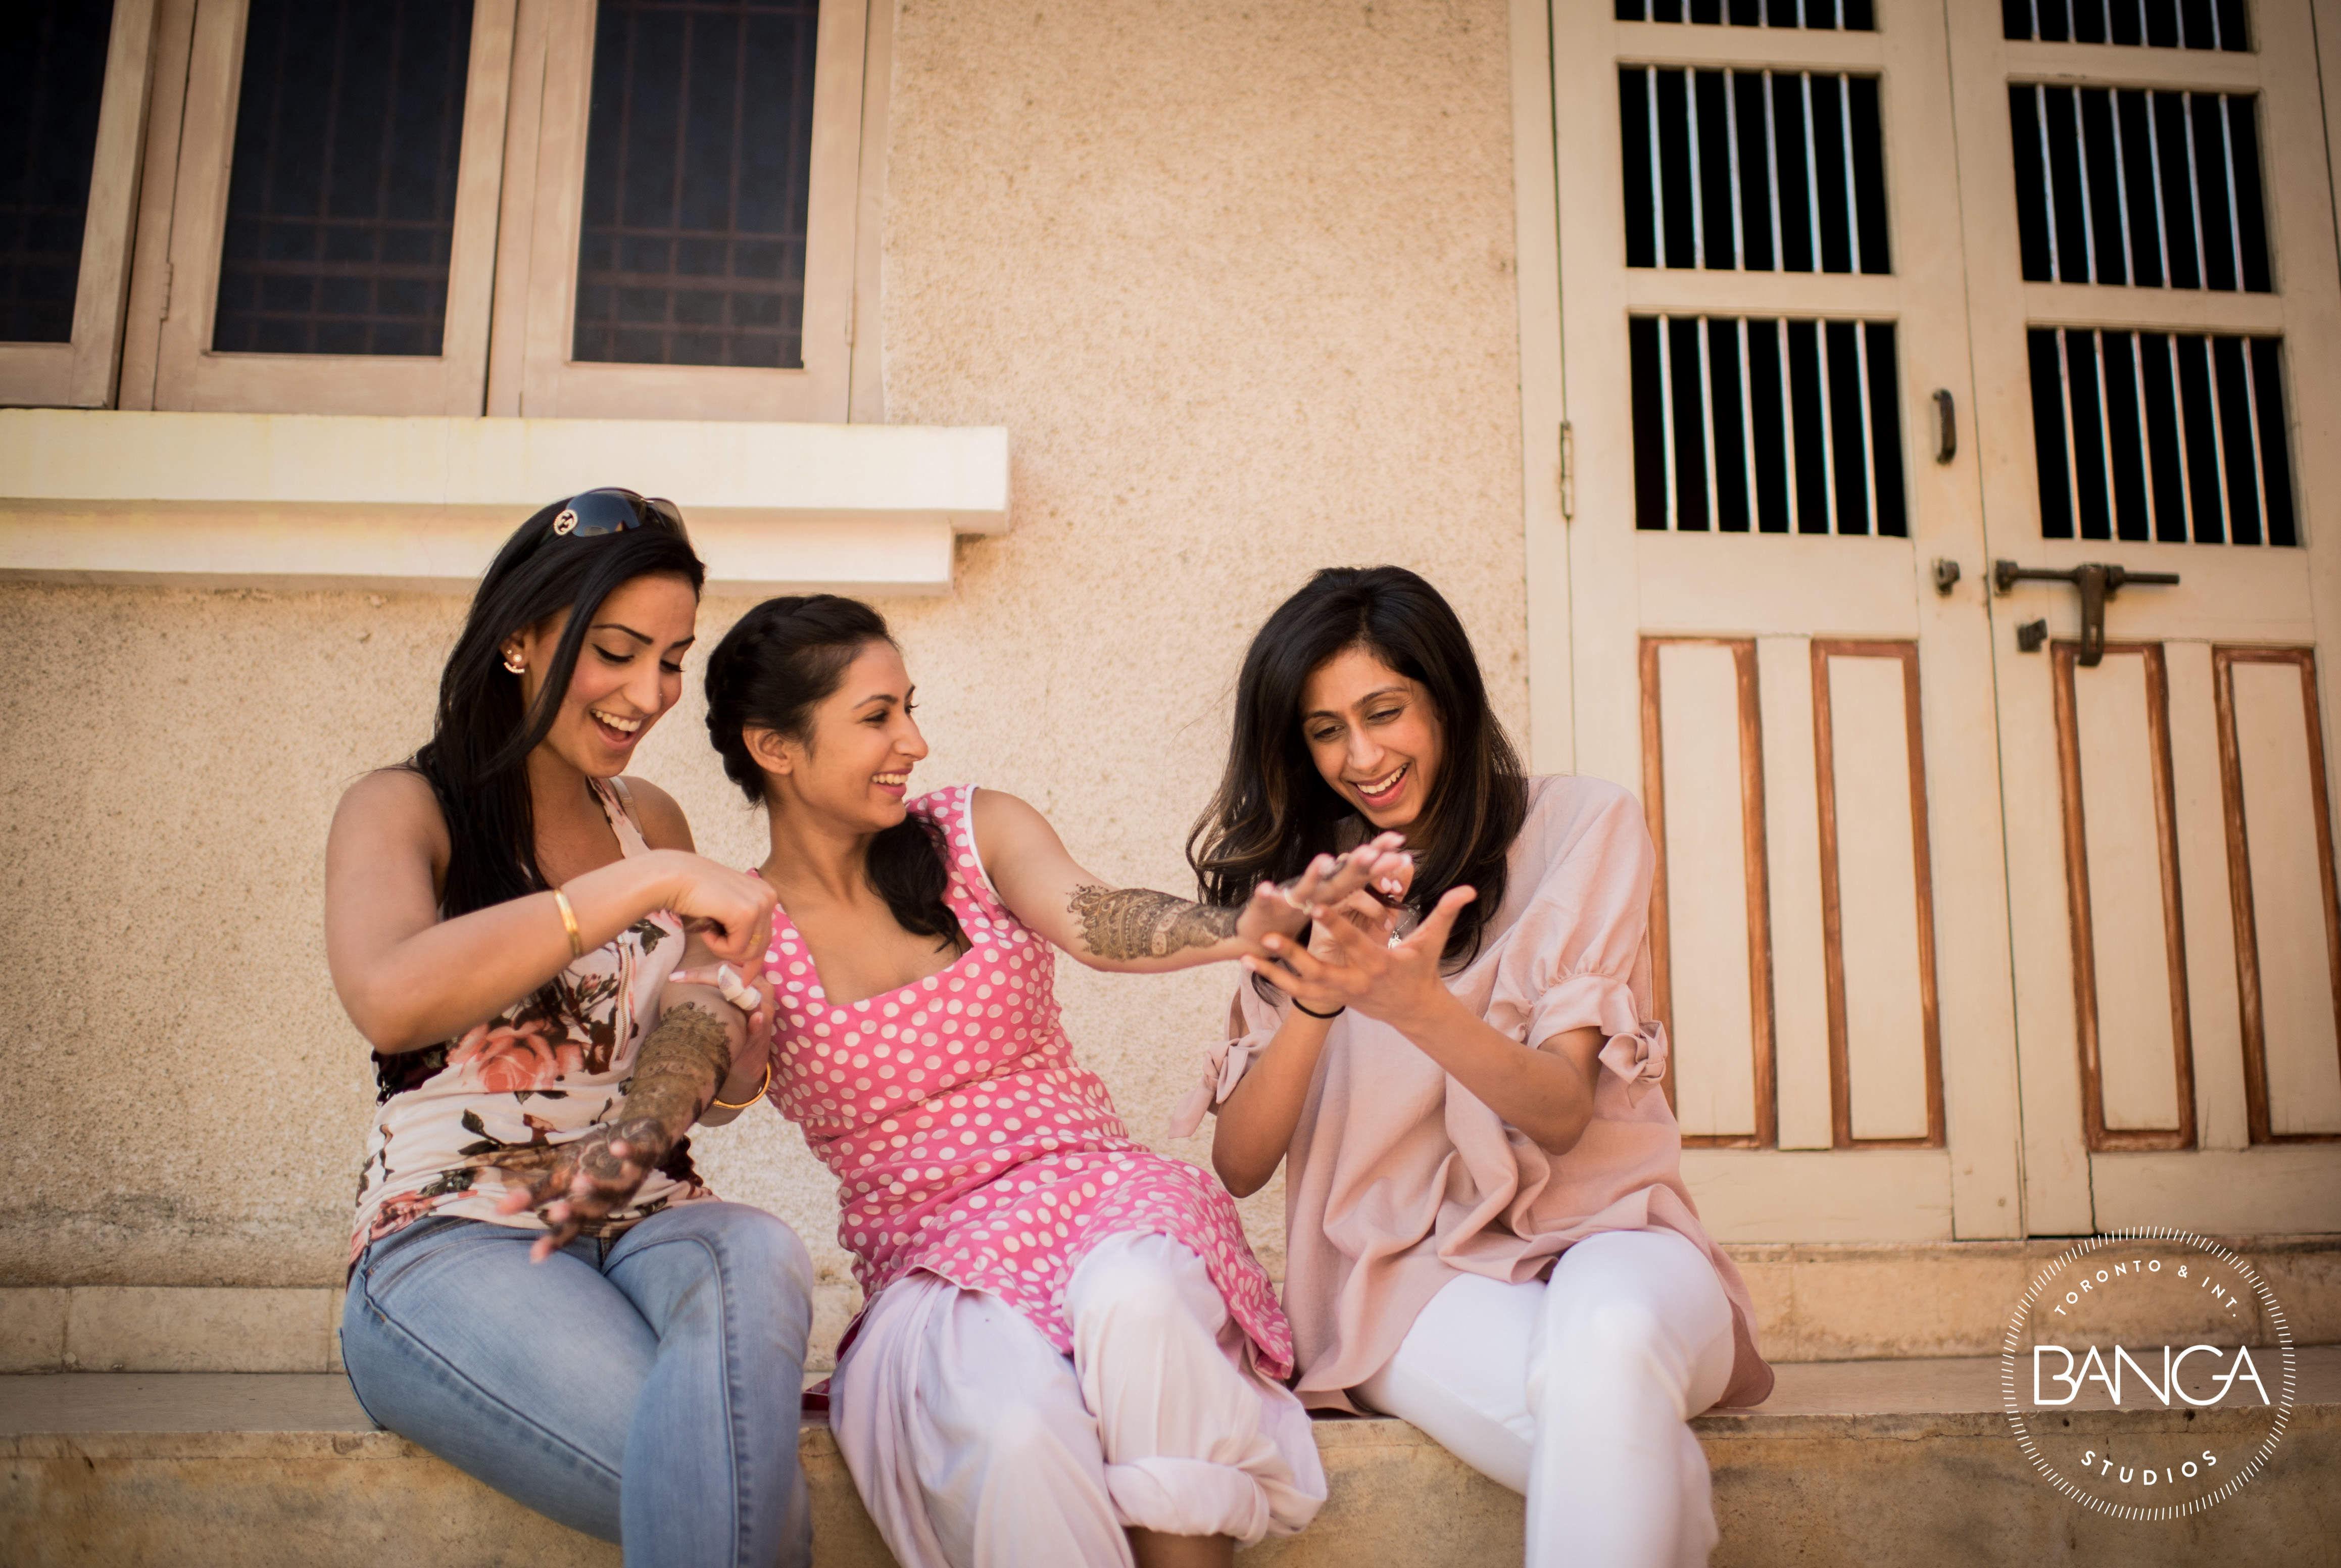 mehandi clicks!:anita dongre timeless, shyamal and bhumika, anushree reddy, banga studios